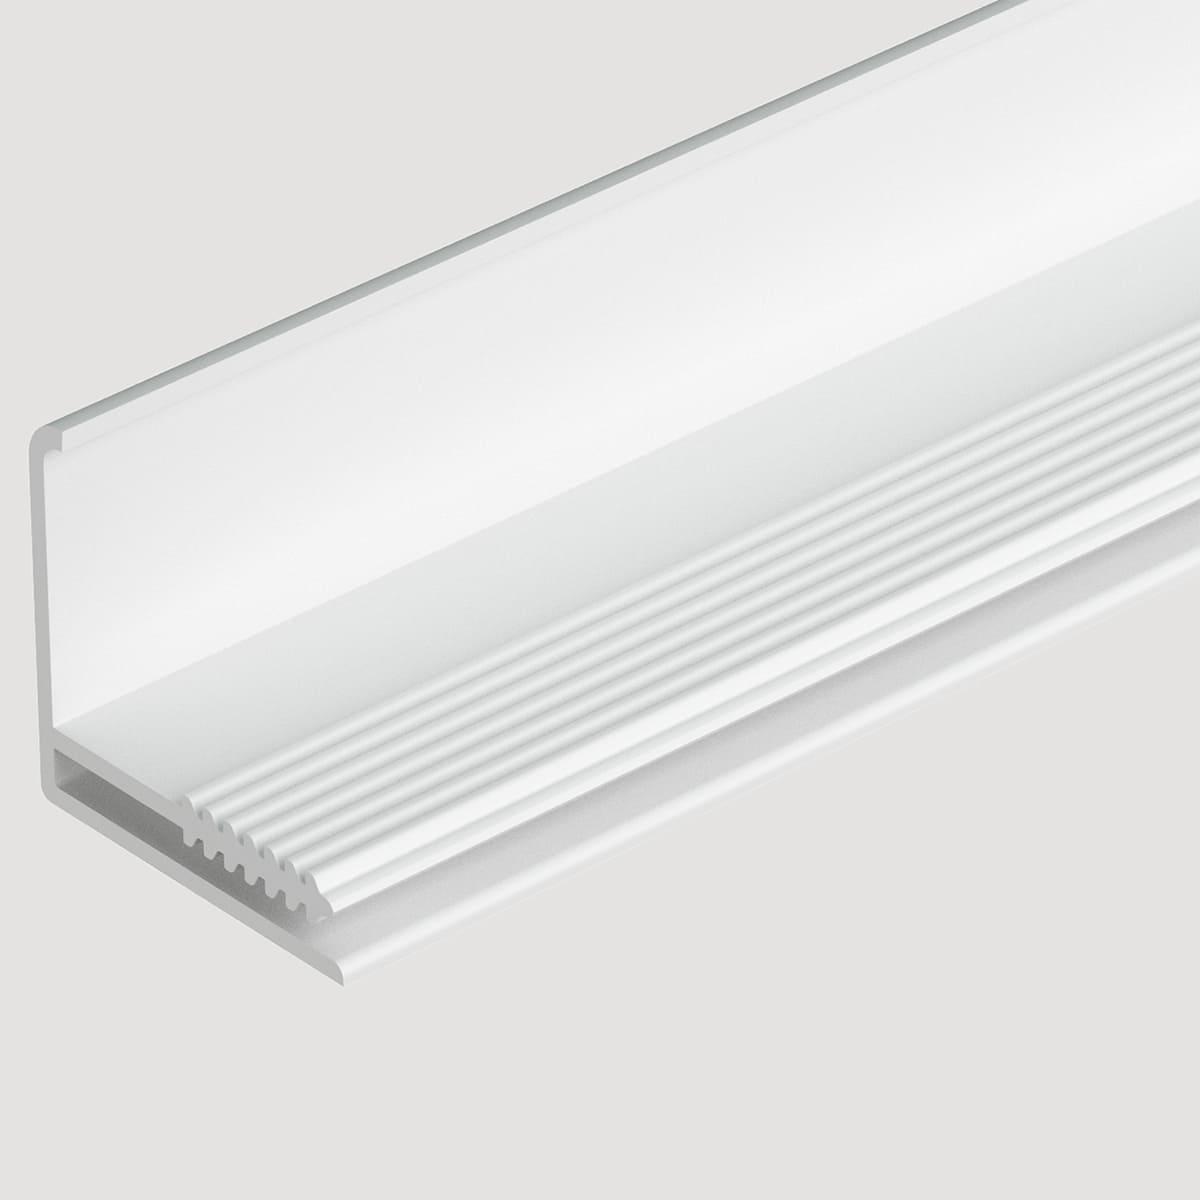 Döcke Фасадный L-профиль 35 мм (Агатовый)